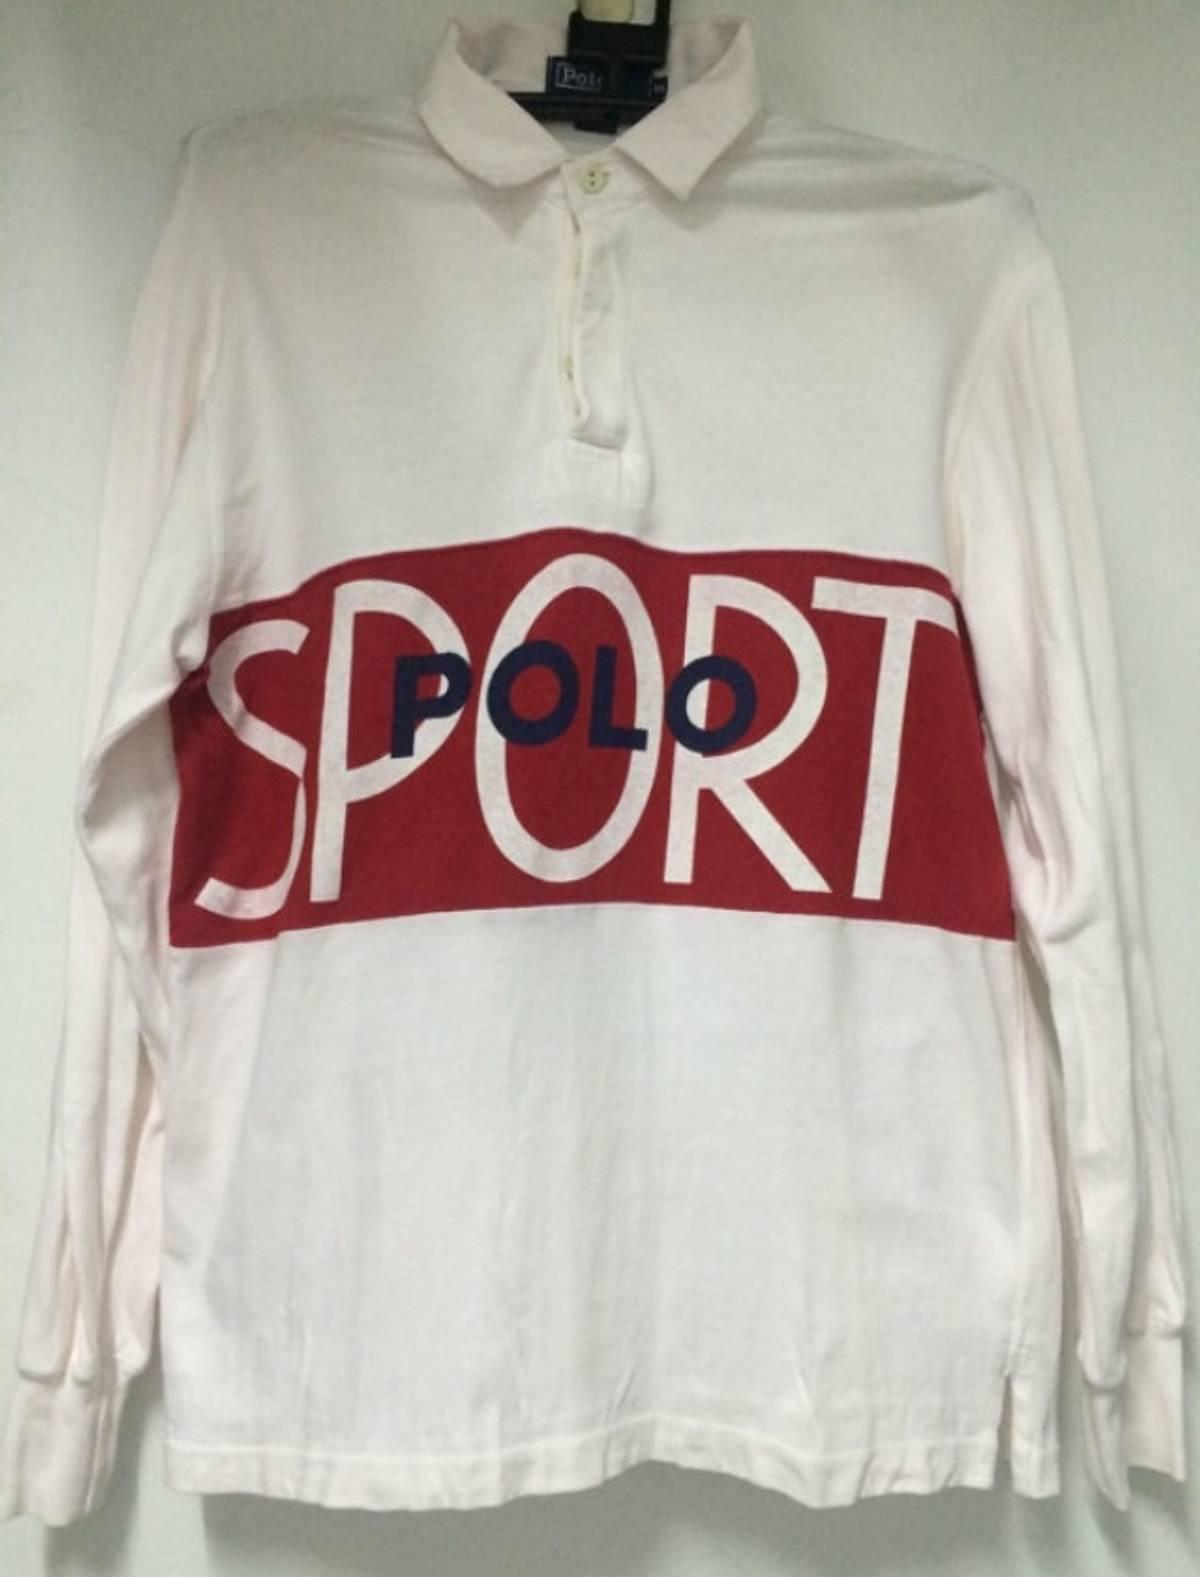 Polo Ralph Lauren Vintage Rare Polo Sport Rugby Shirt Polo Stadium